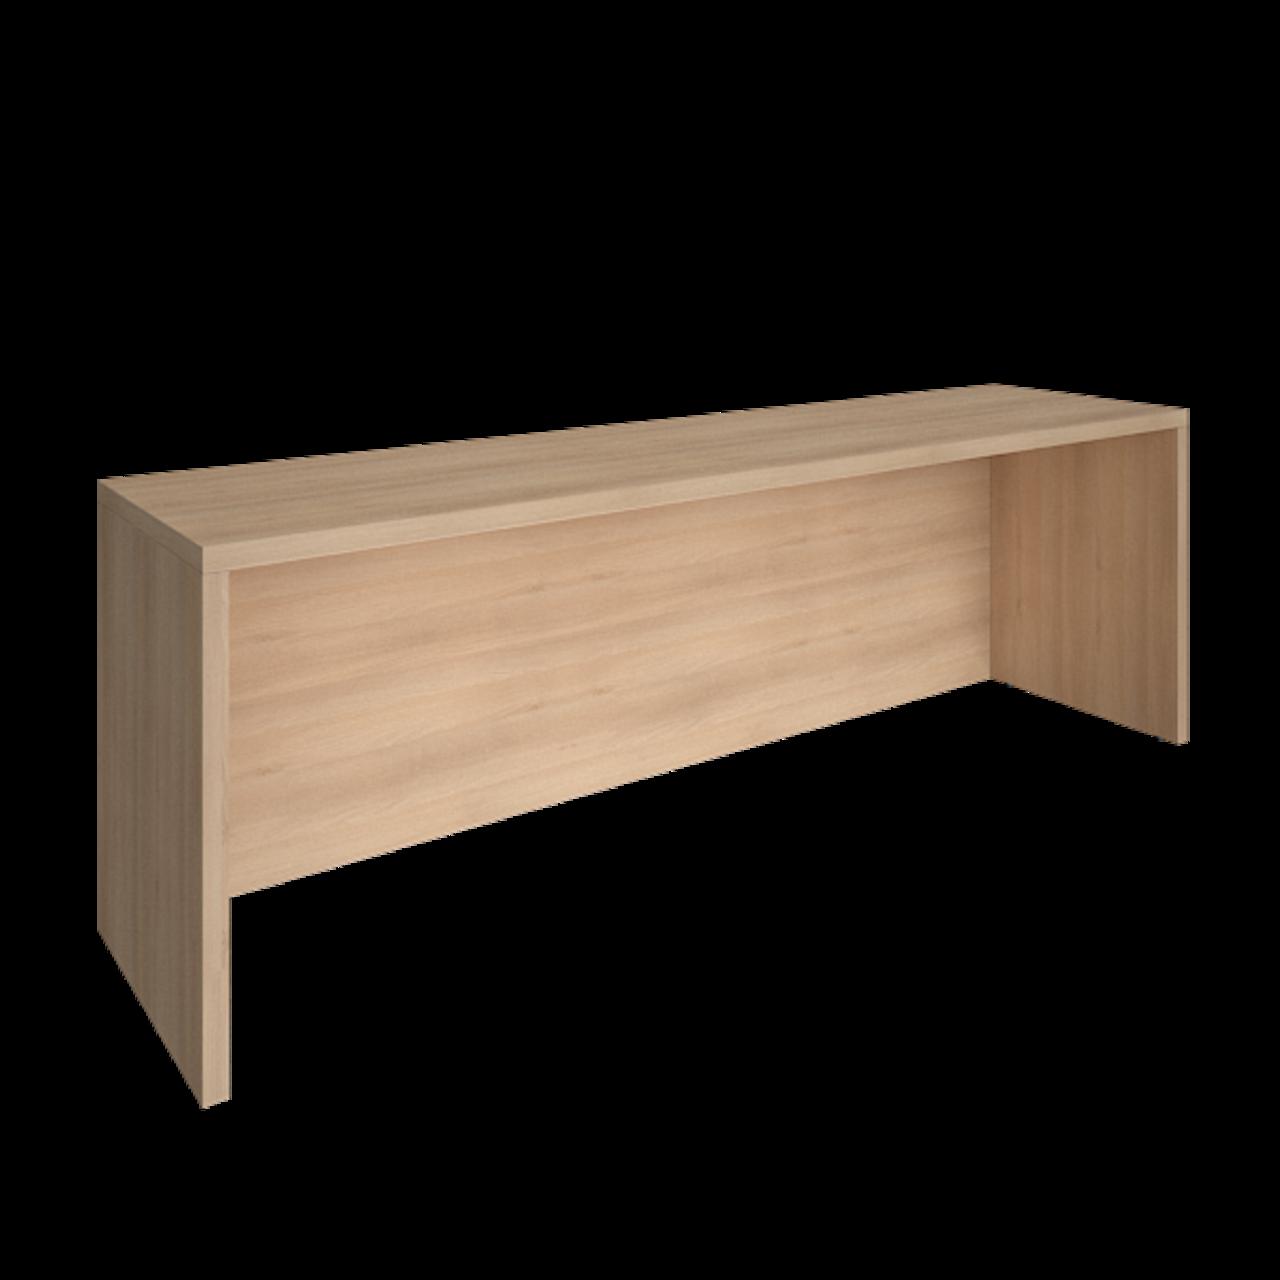 Пристенный стол - фото 5